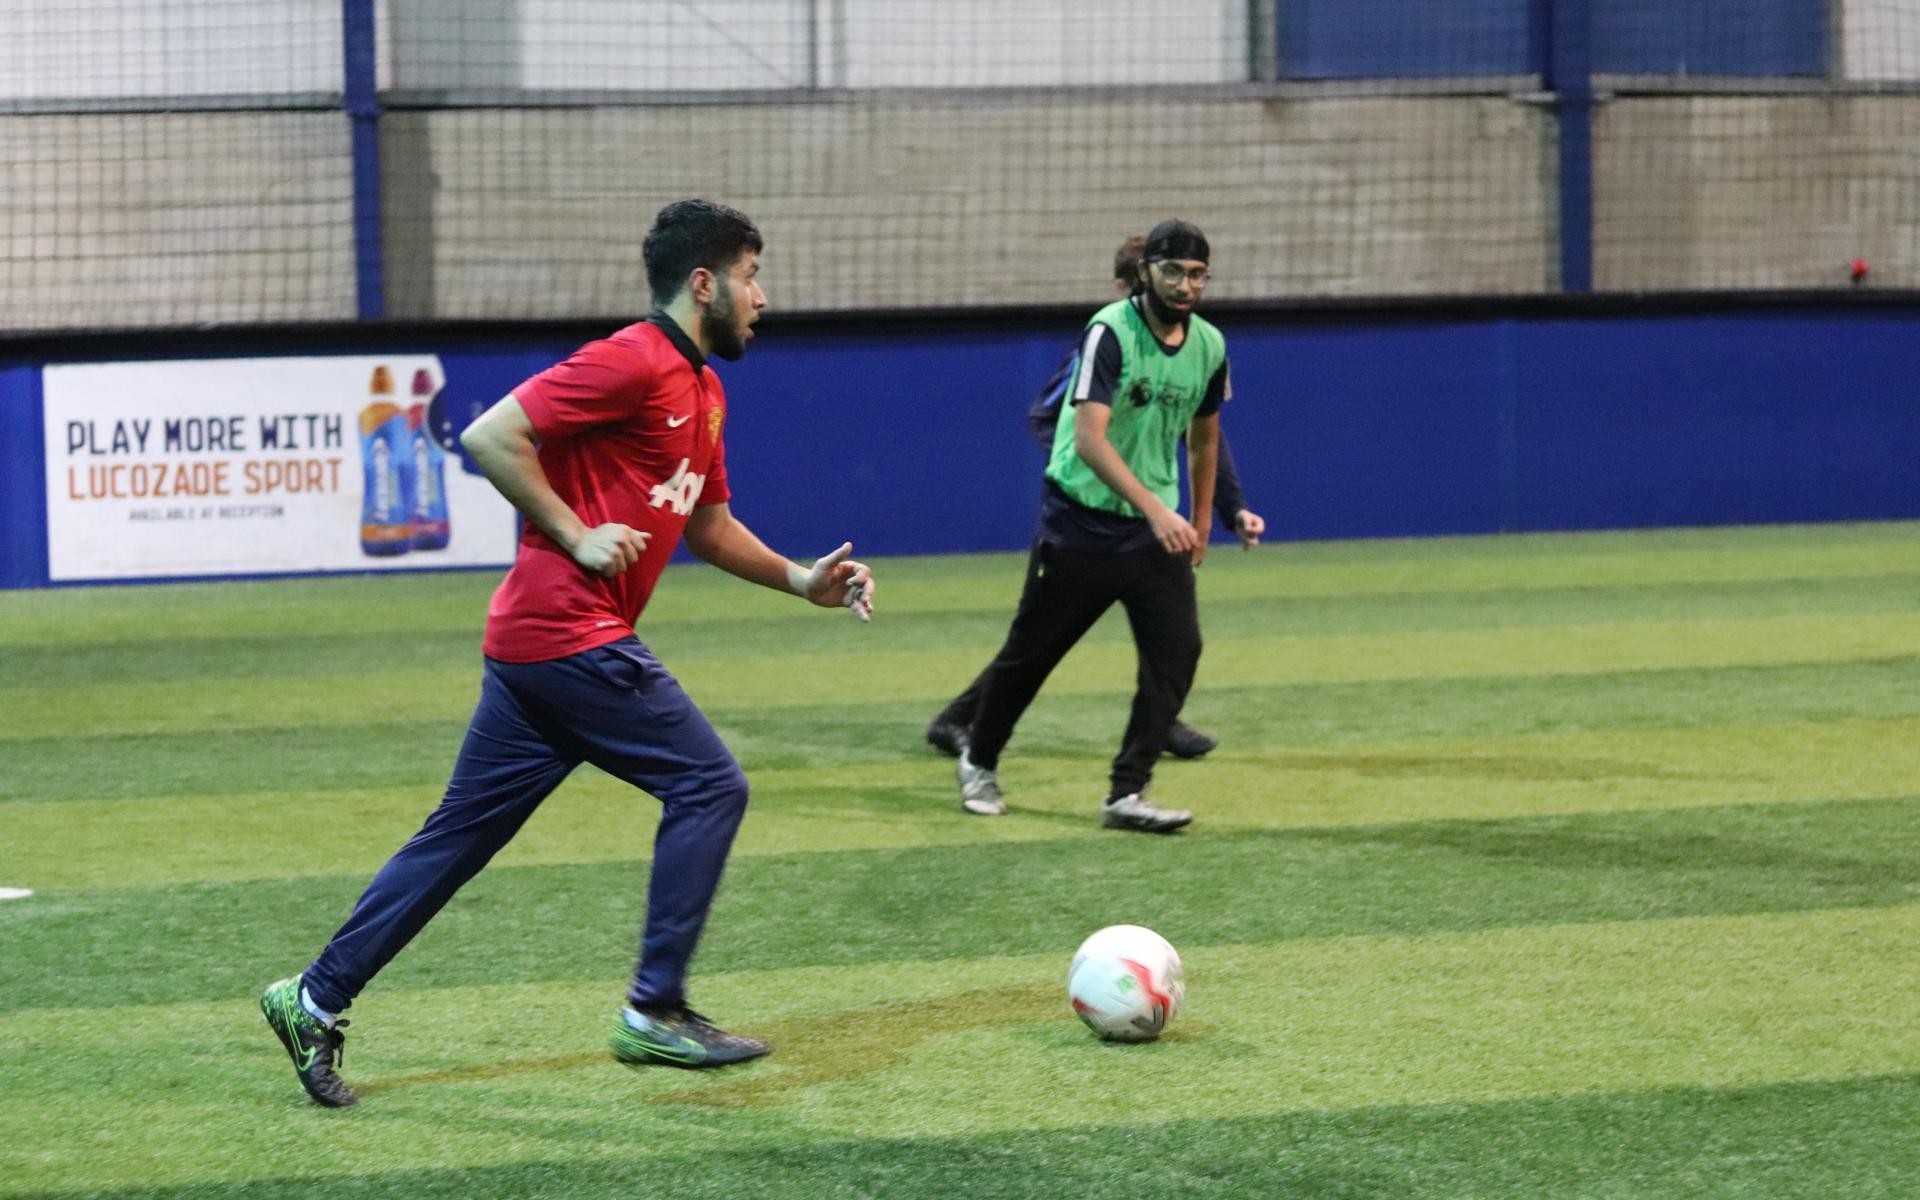 Teenagers playing football